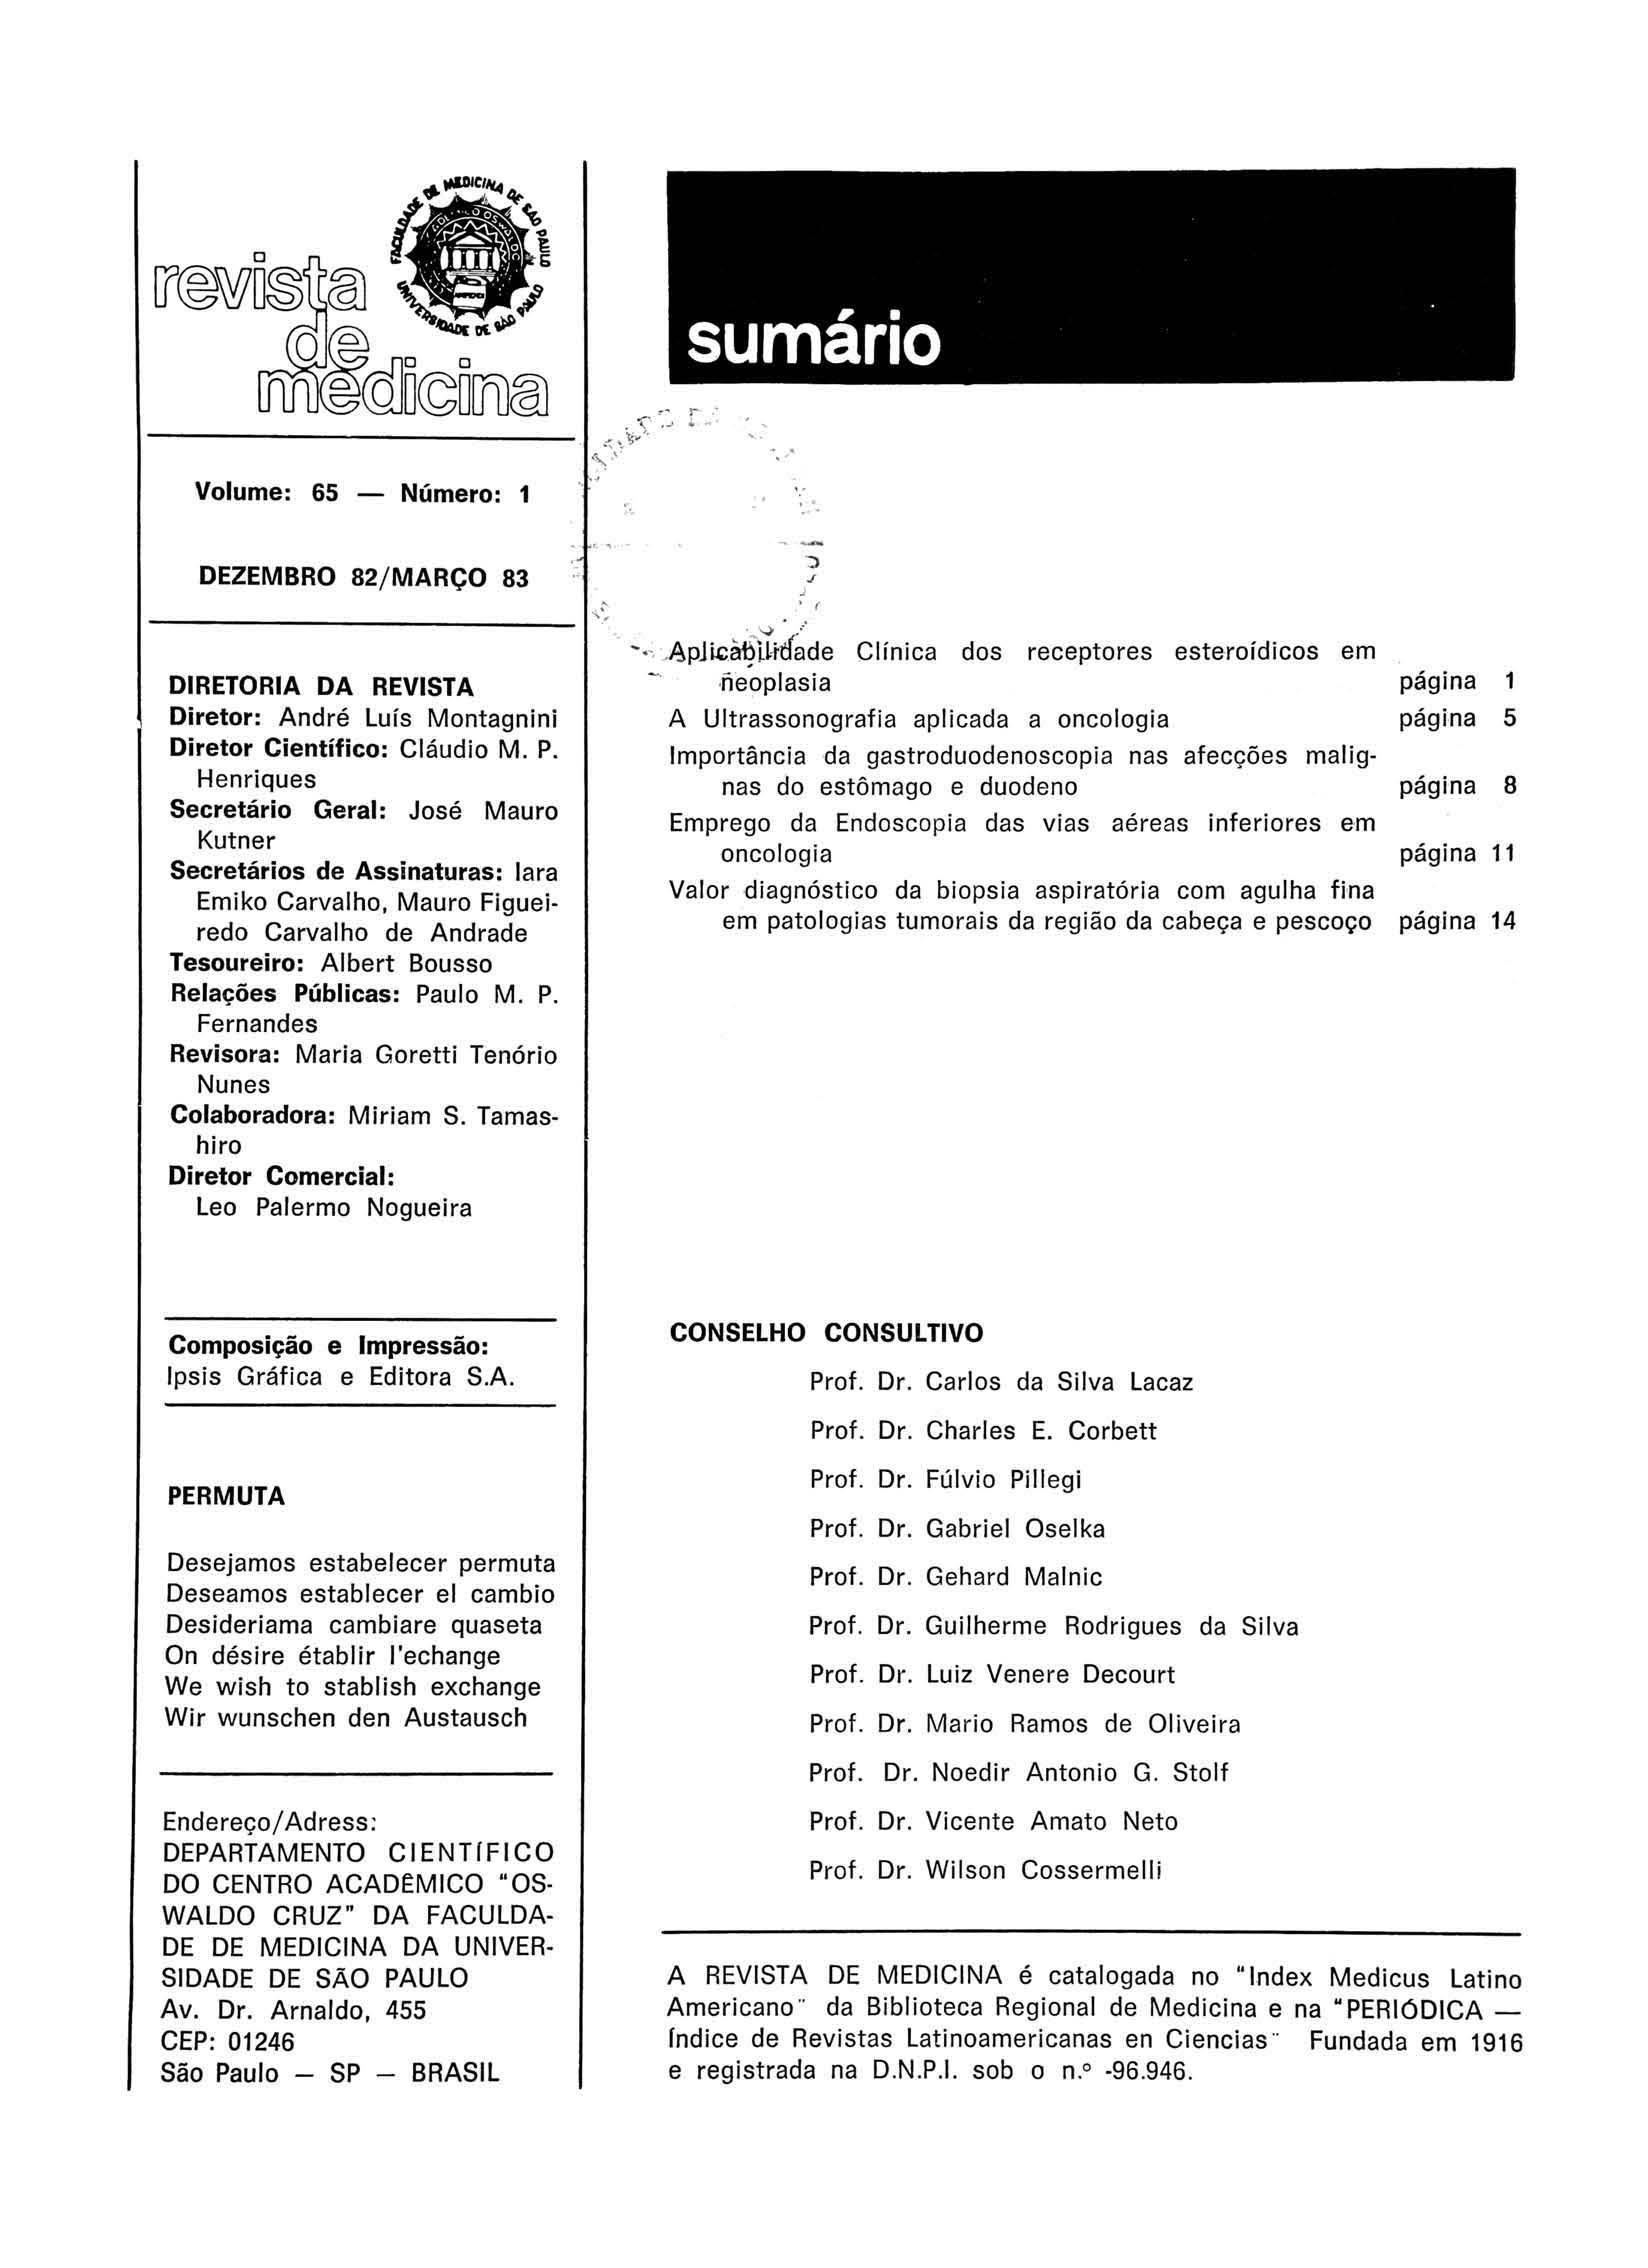 Visualizar v. 65 n. 1 (1983)